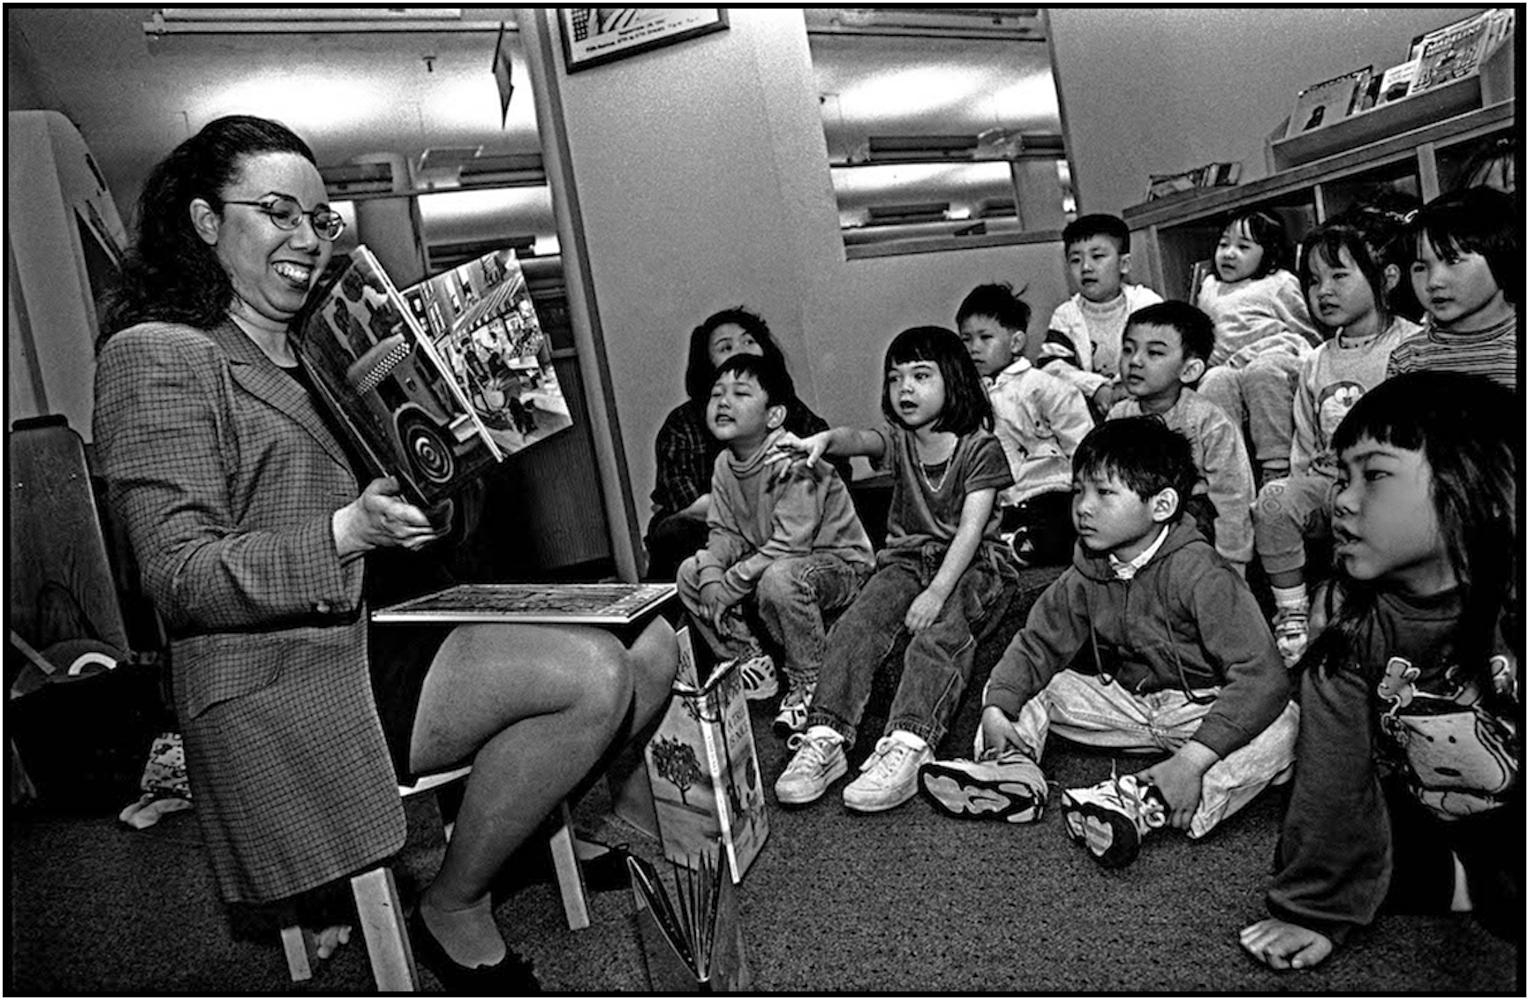 Child librarian, New Amsterdam branch, New York Public Library, Manhattan.